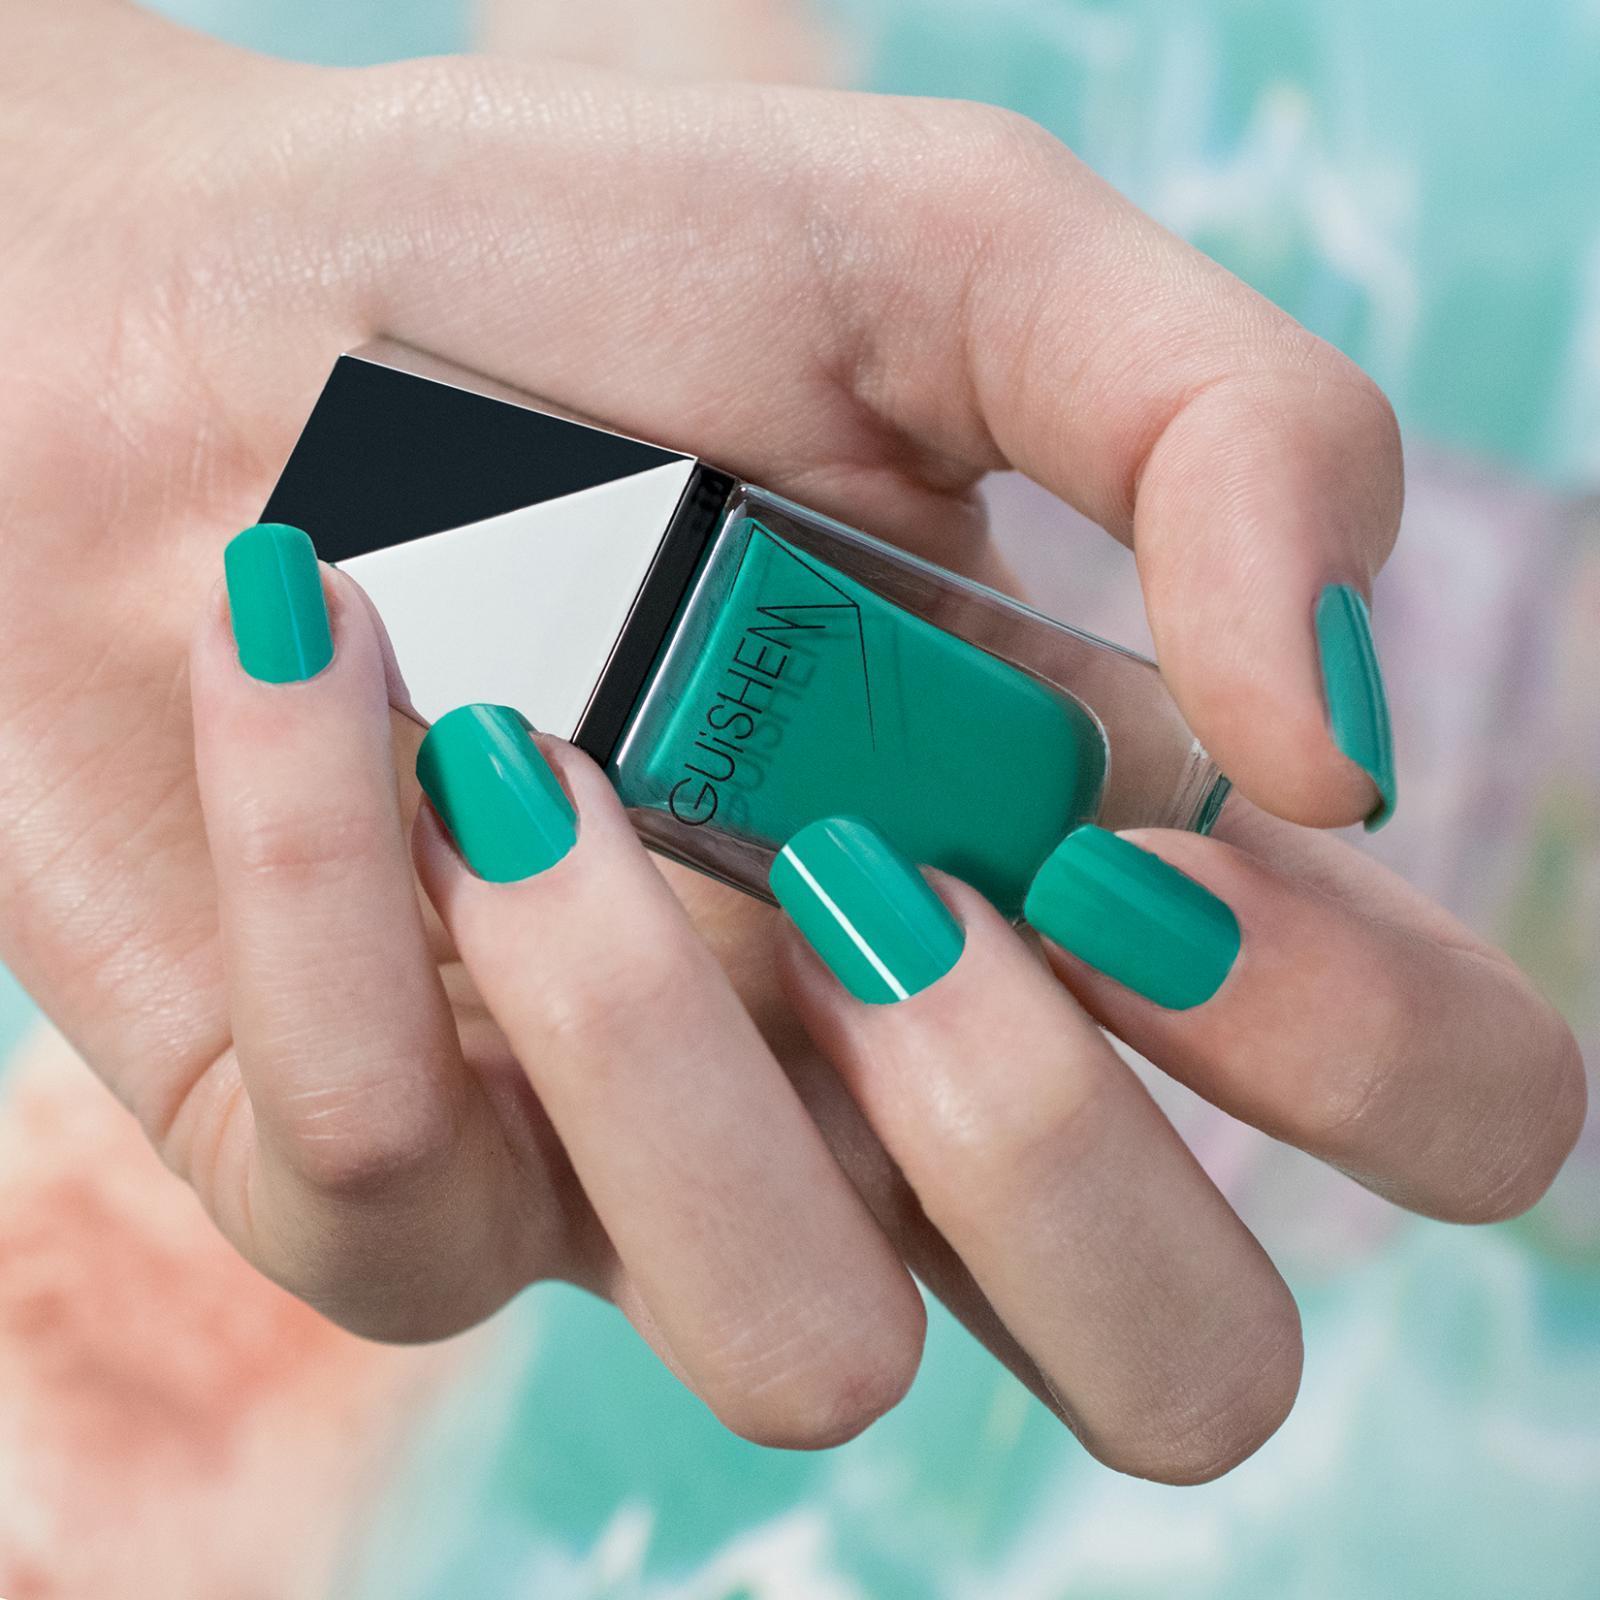 GUiSHEM Premium Nail Lacquer Crème Deep Turquoise, Sheva - 179